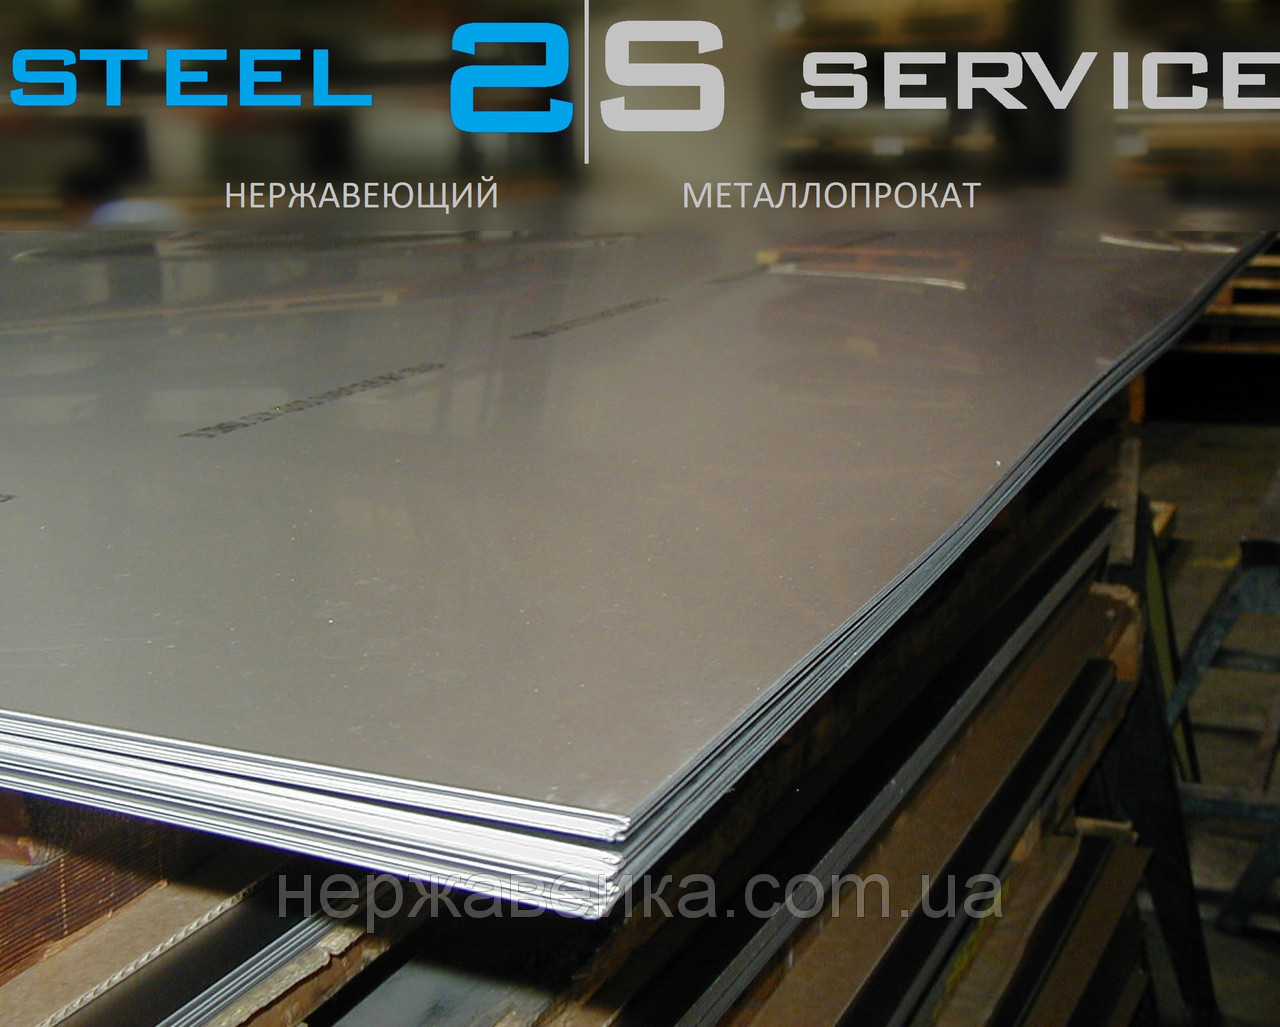 Нержавейка лист 16х1000х2000мм  AISI 316Ti(10Х17Н13М2Т) F1 - горячекатанный,  кислотостойкий